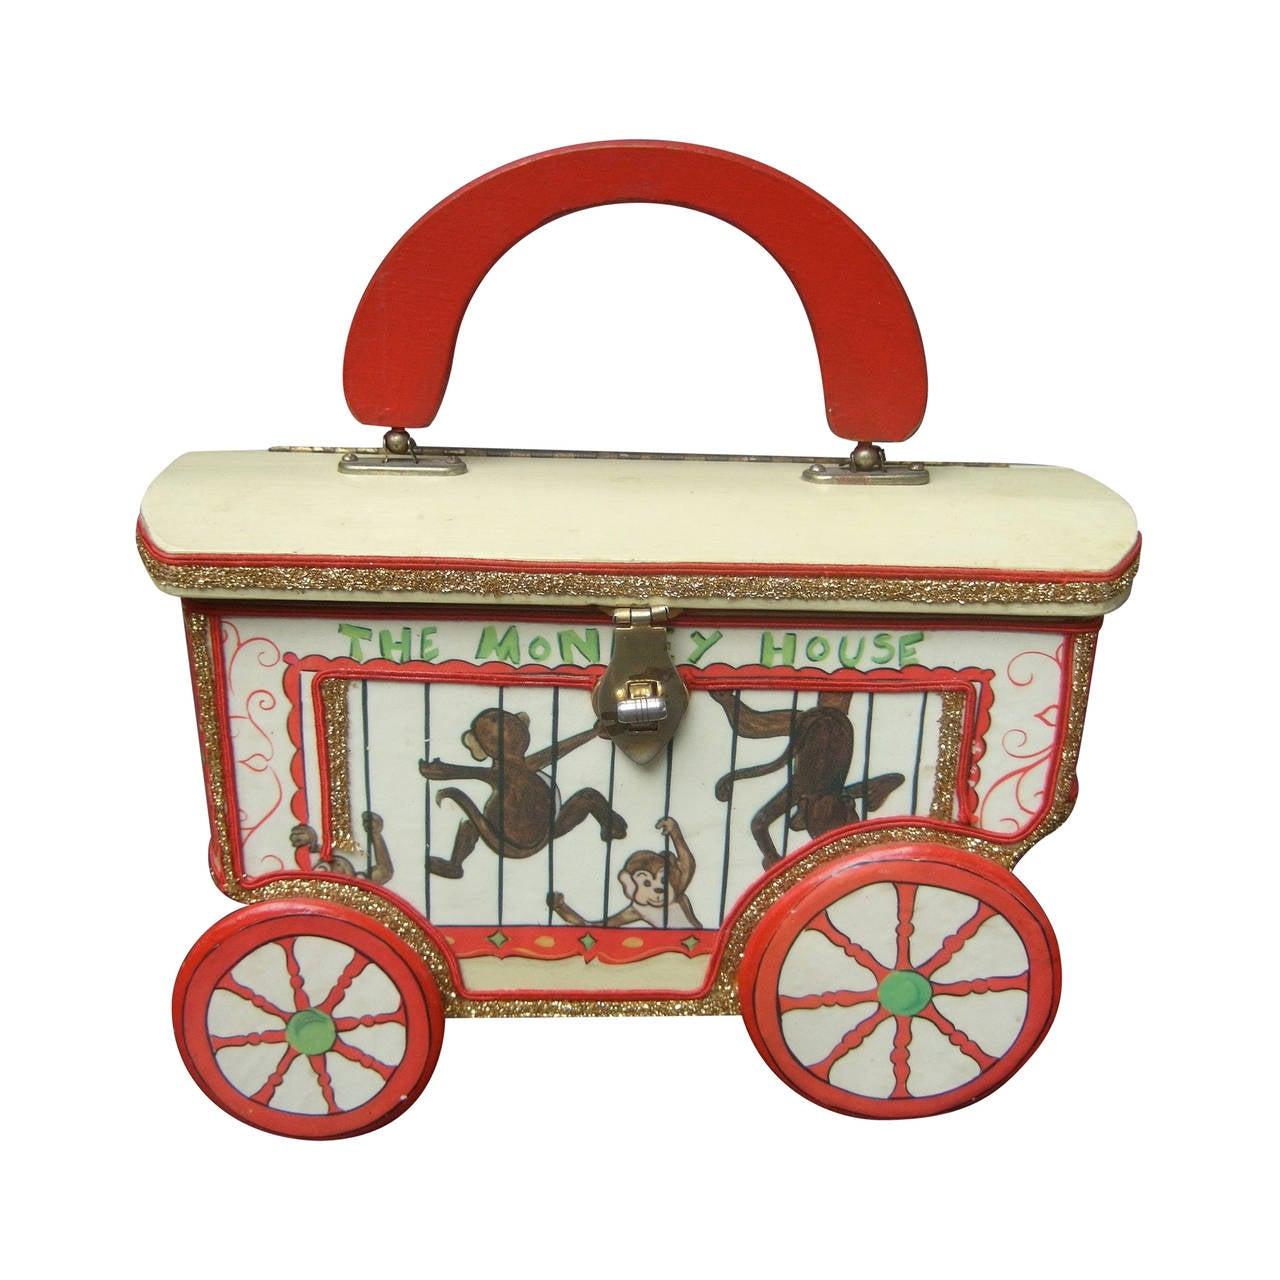 Whimsical Monkey Circus Theme Decoupage Handbag c 1970 1